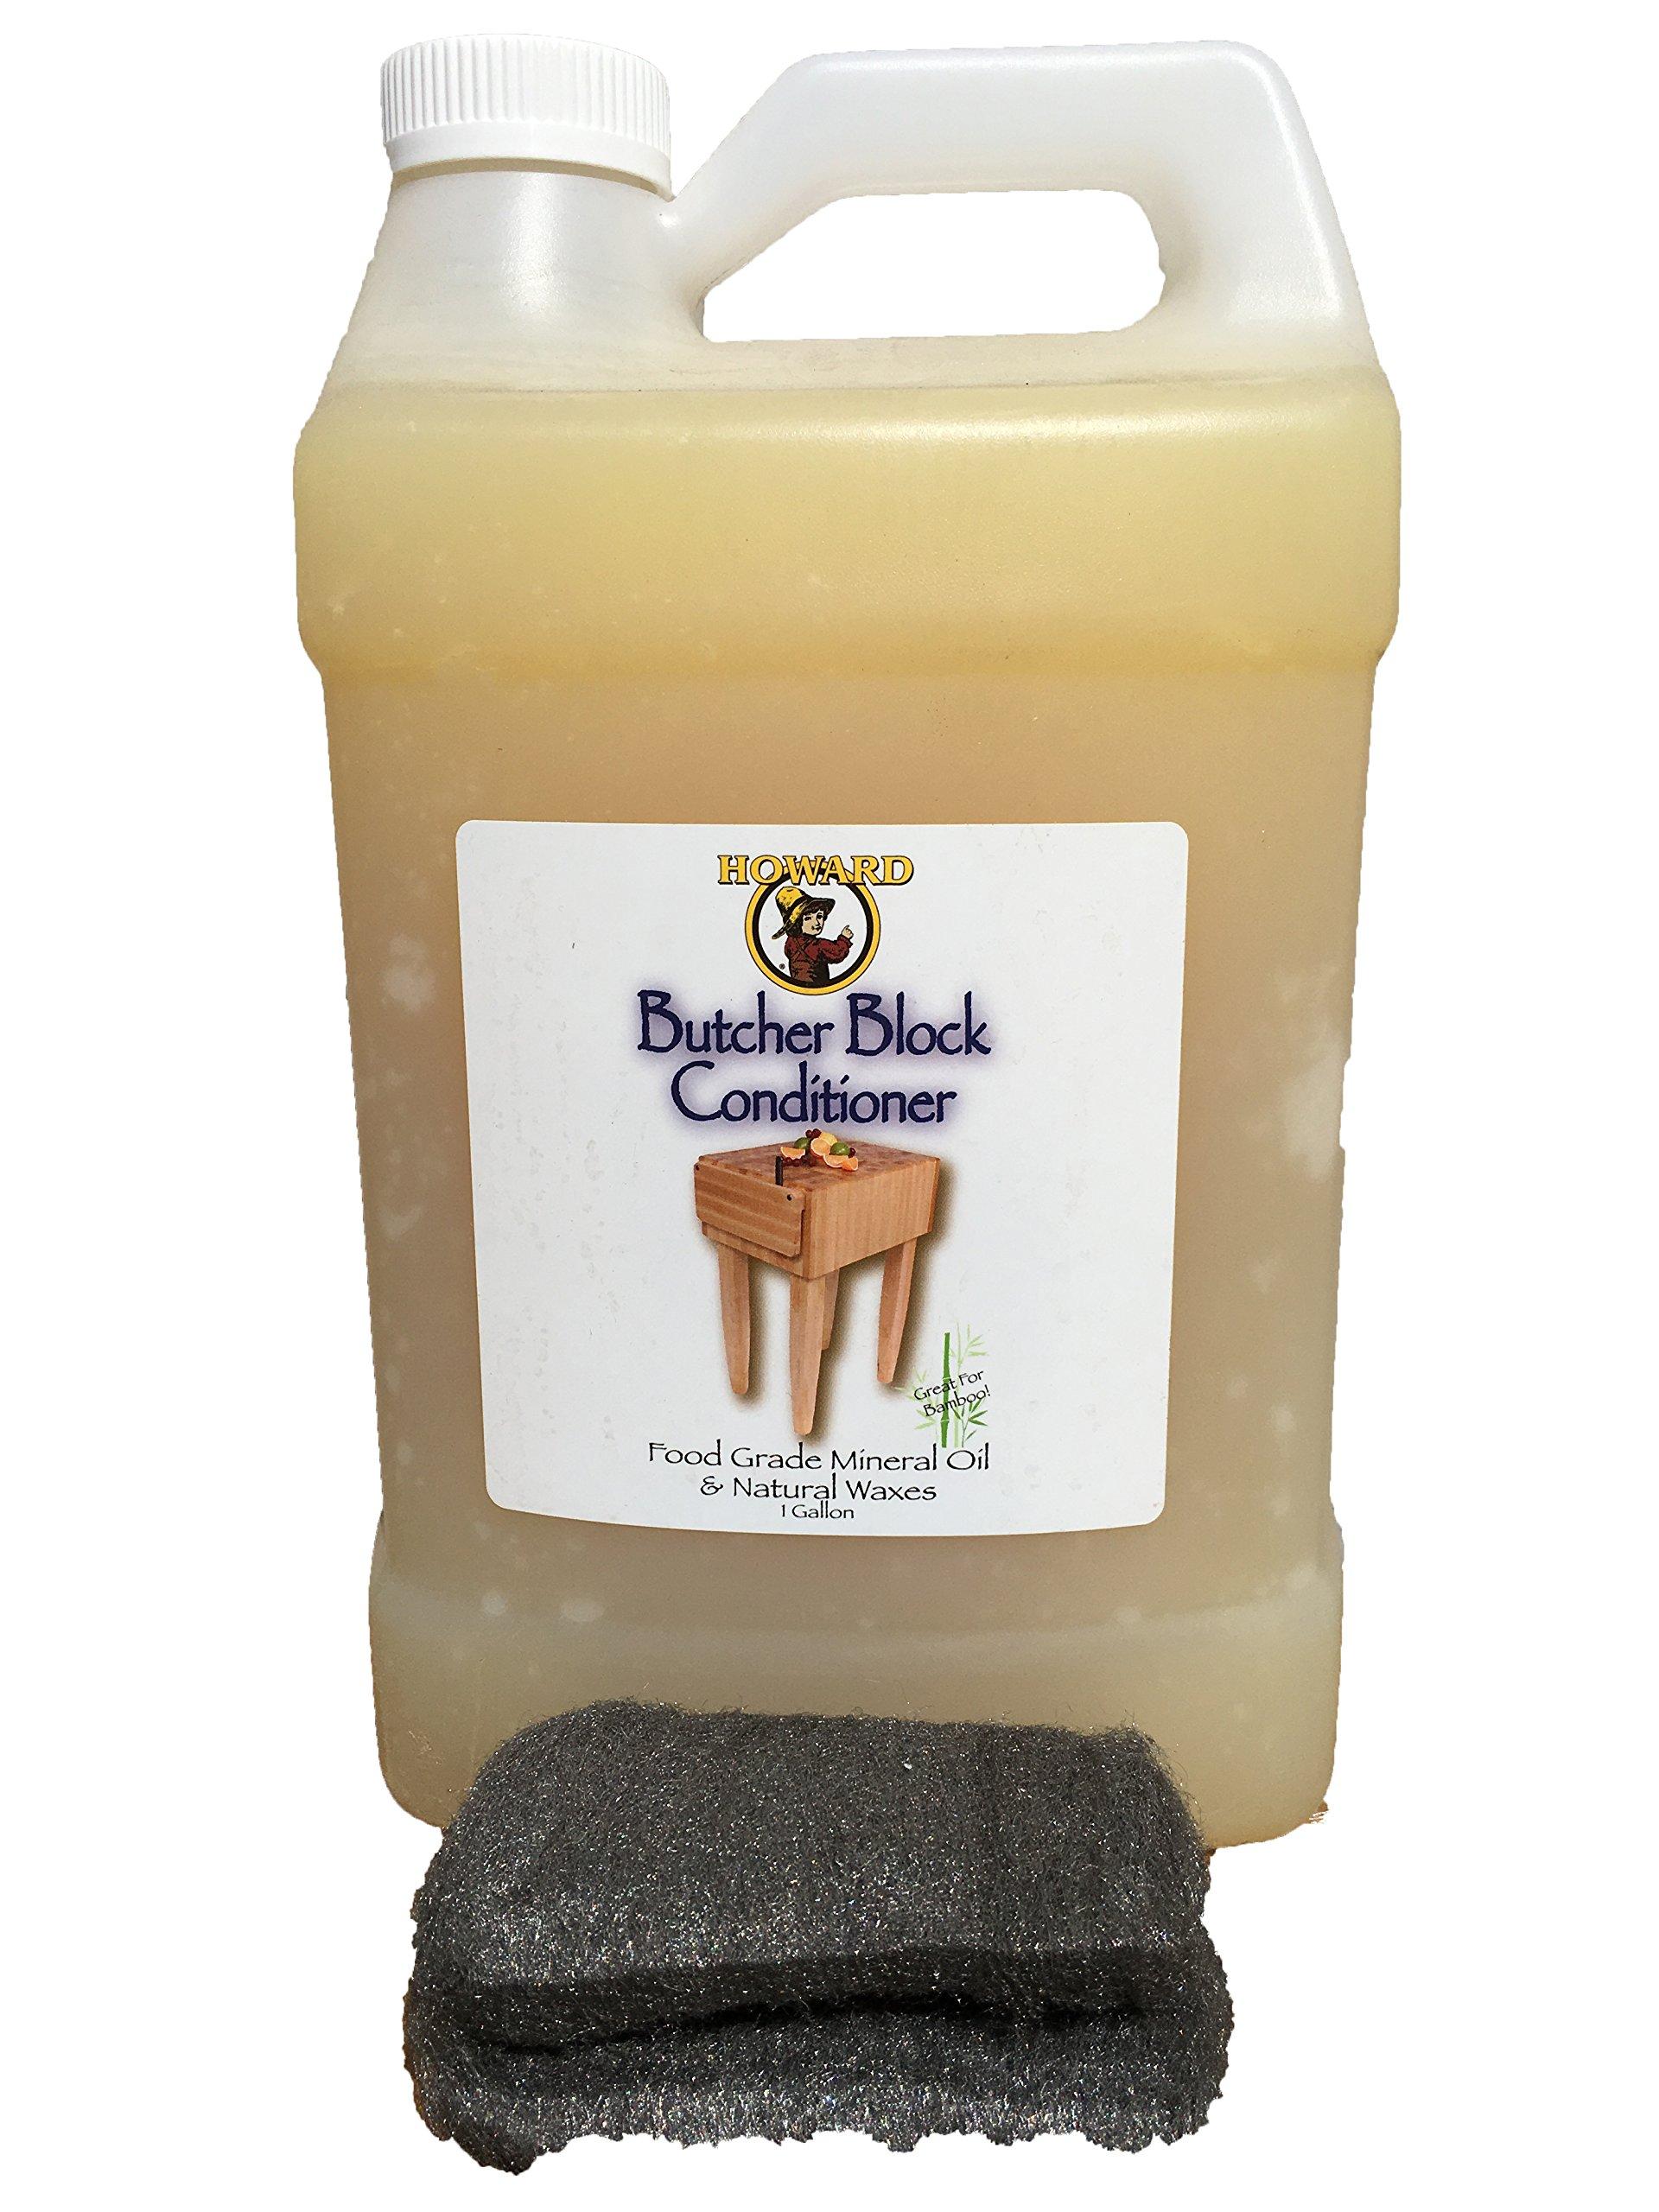 Howard Butcher Block Conditioner Gallon 128 Ounces, Enriched with Orange Oils, Food Grade with Vitamin E